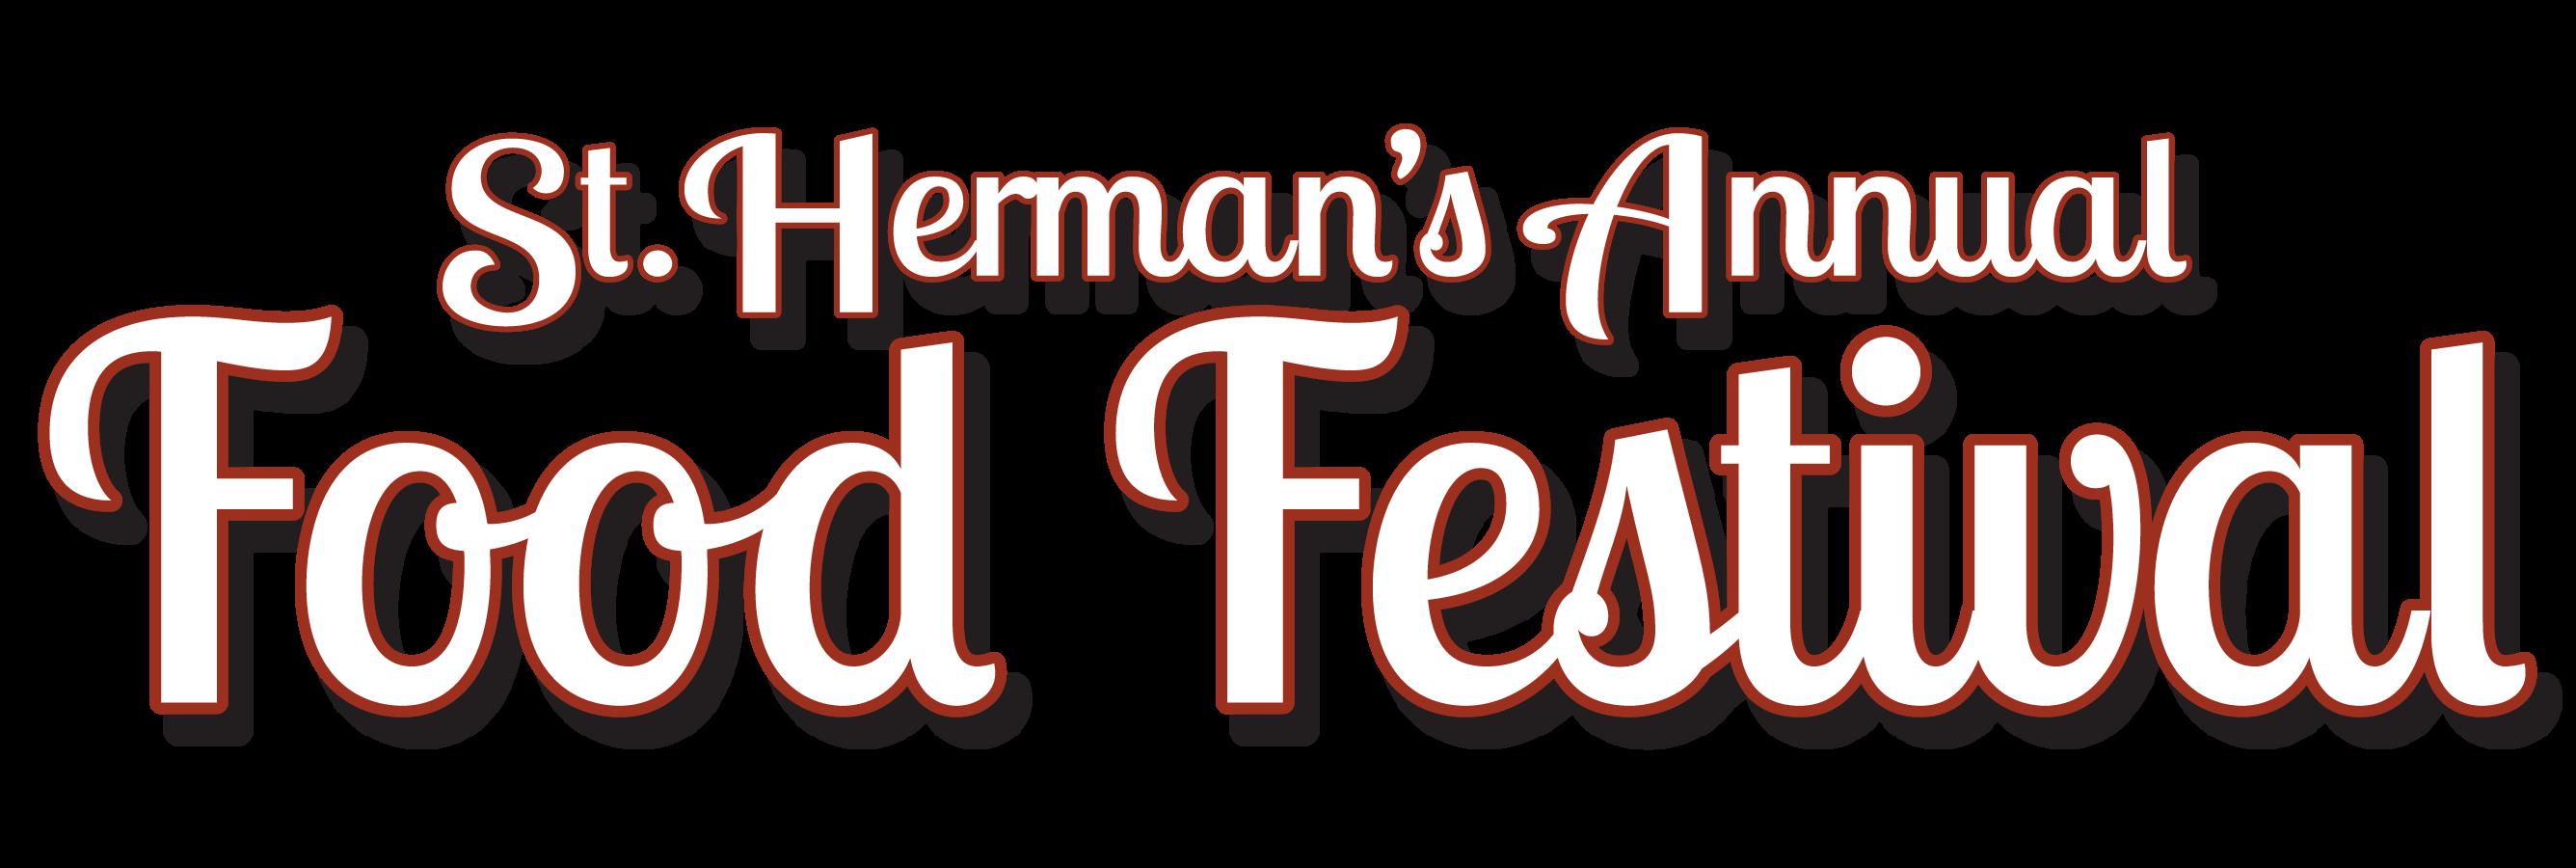 St. Herman's Annual Food Festival